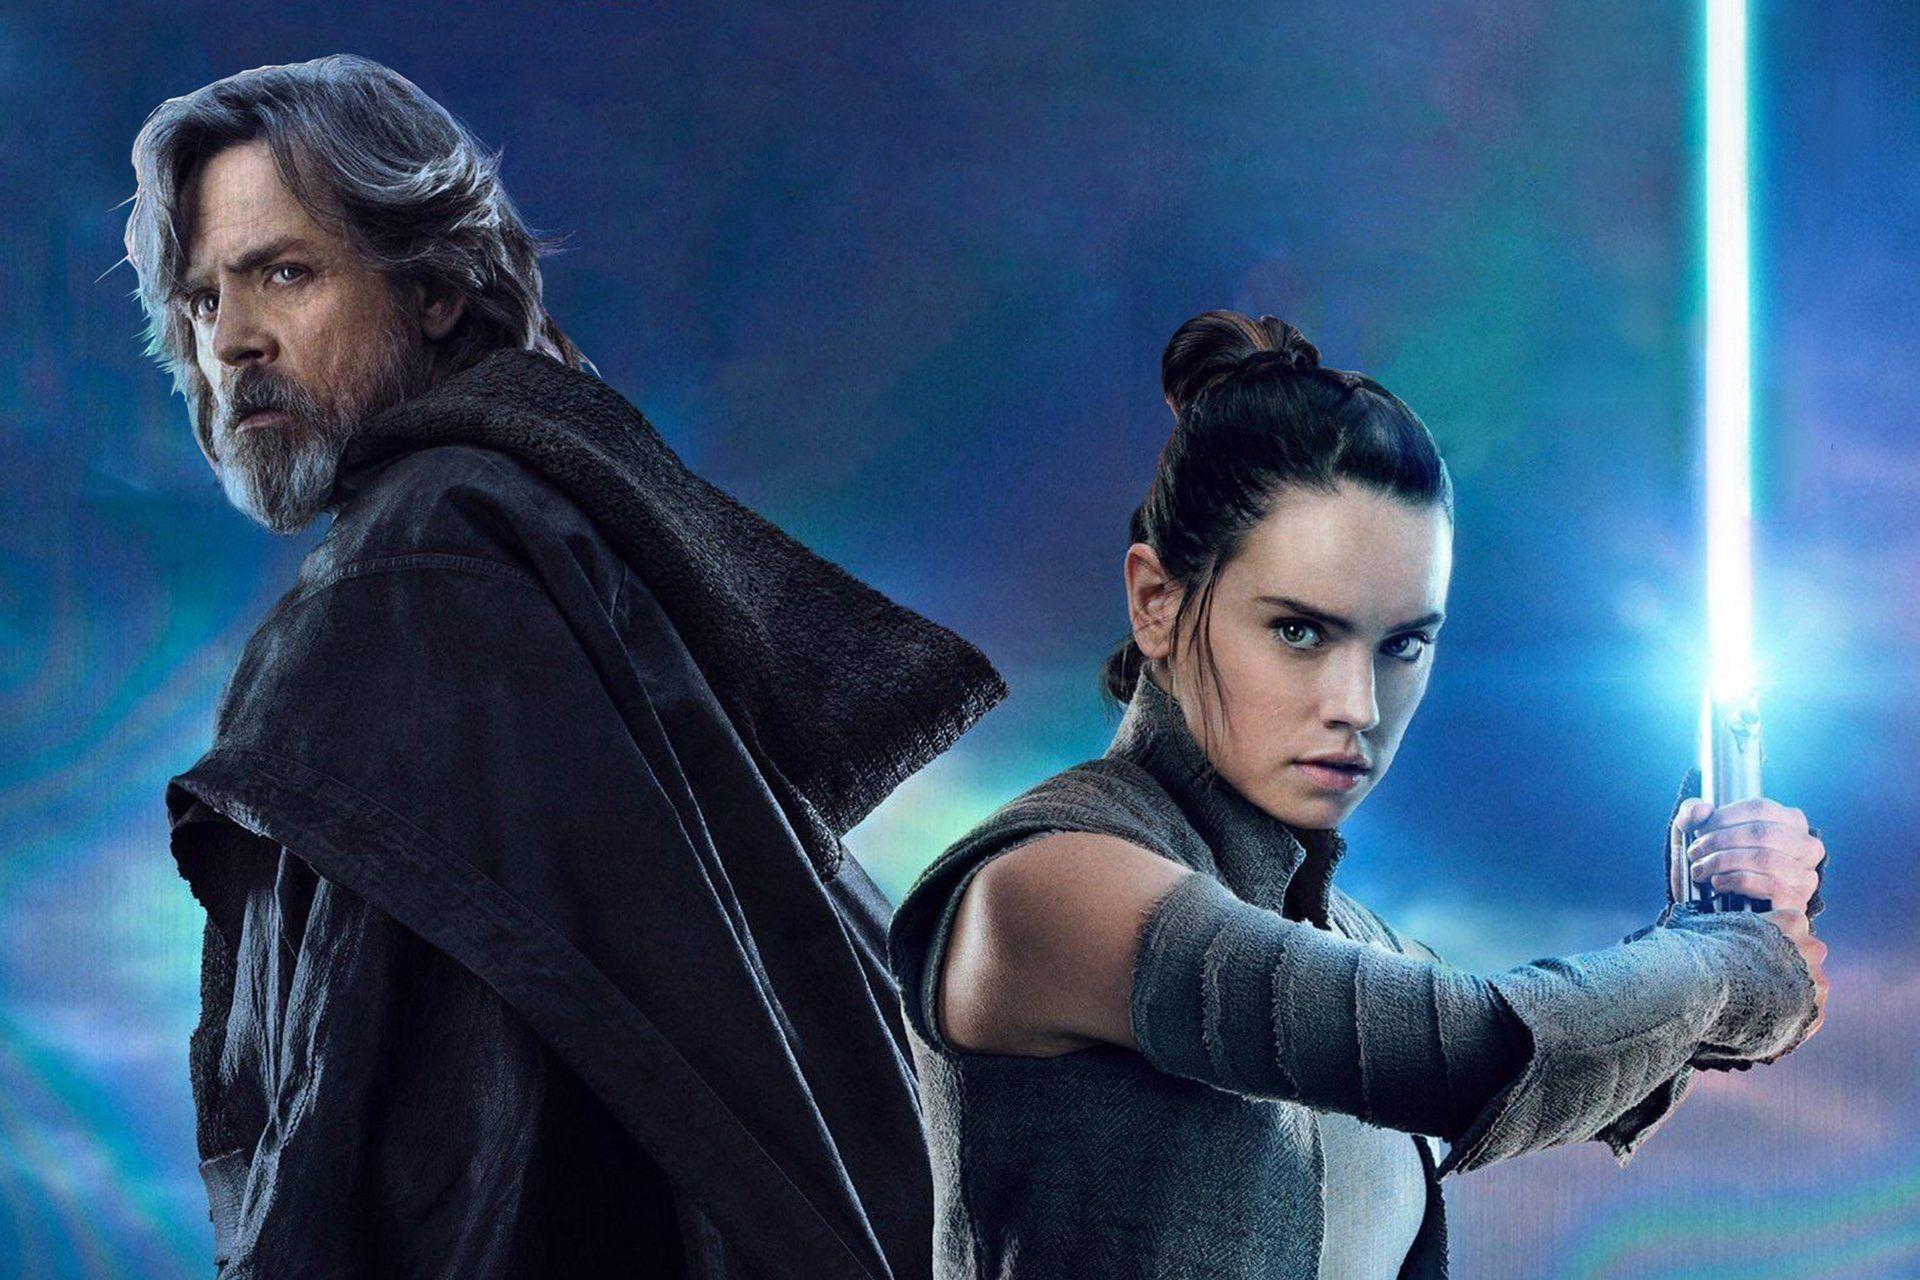 Rey Skywalker Wallpapers Top Free Rey Skywalker Backgrounds Wallpaperaccess